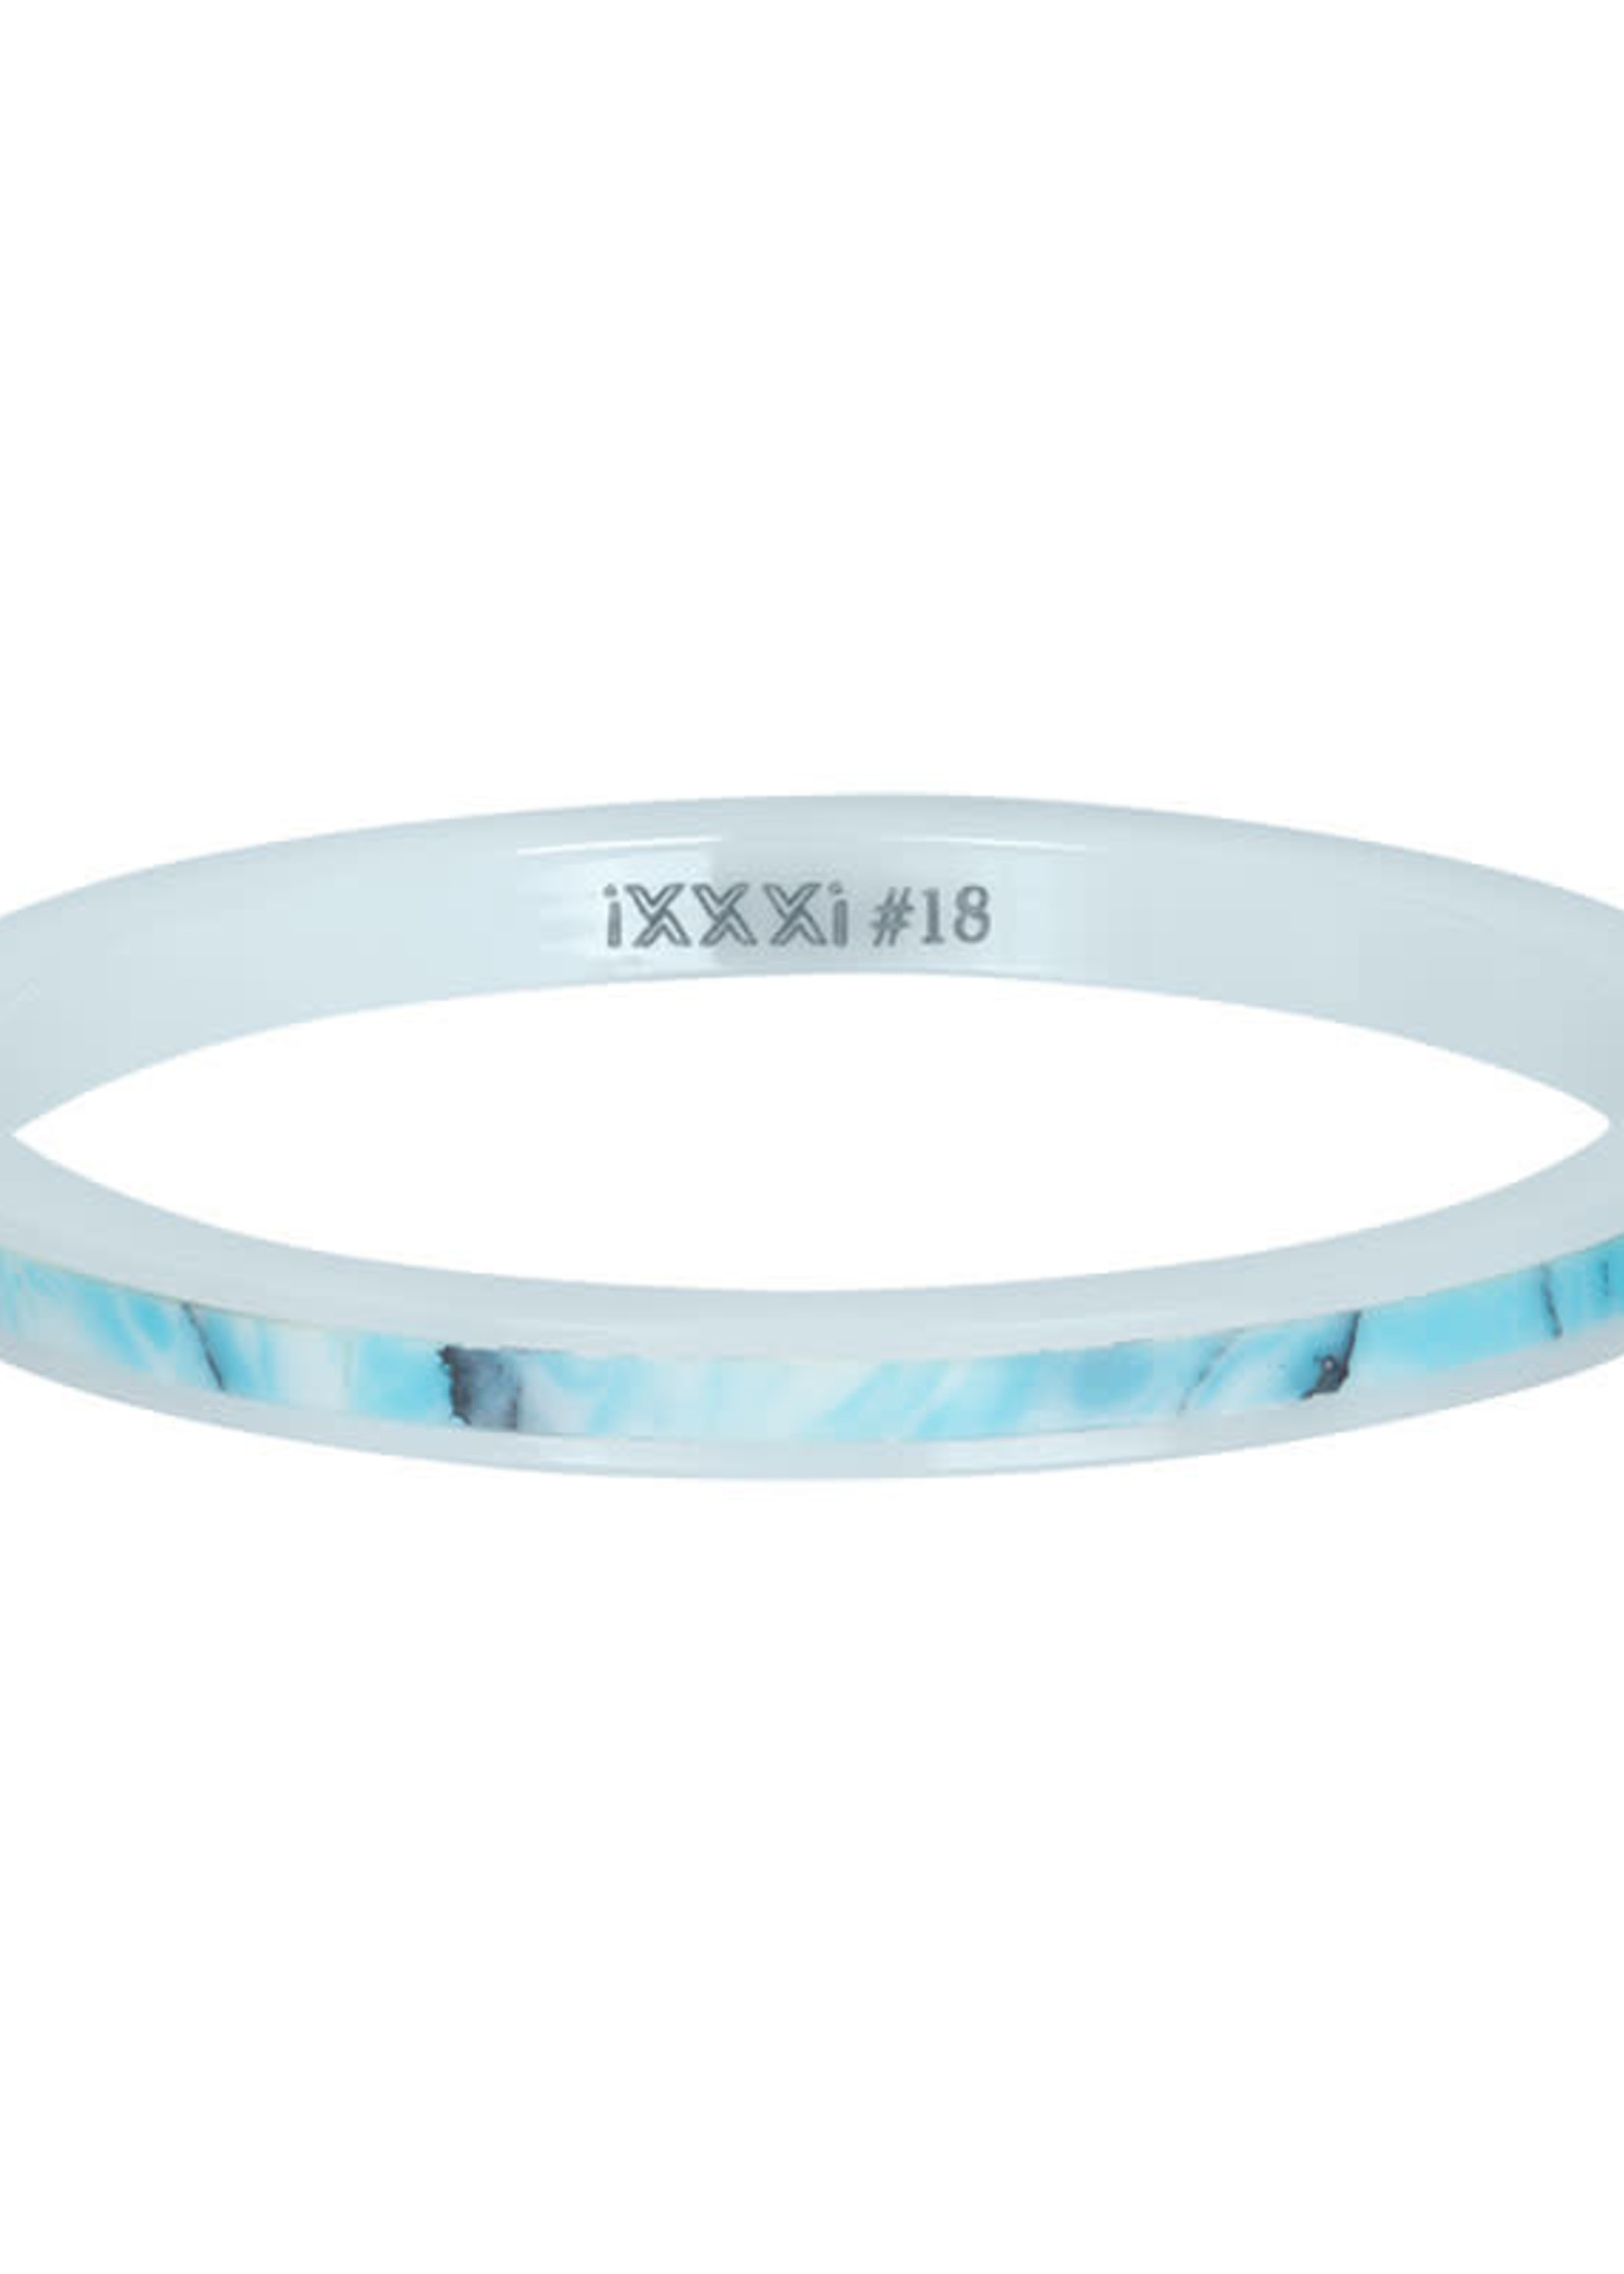 iXXXi ringen iXXXi ceramic blue paradise